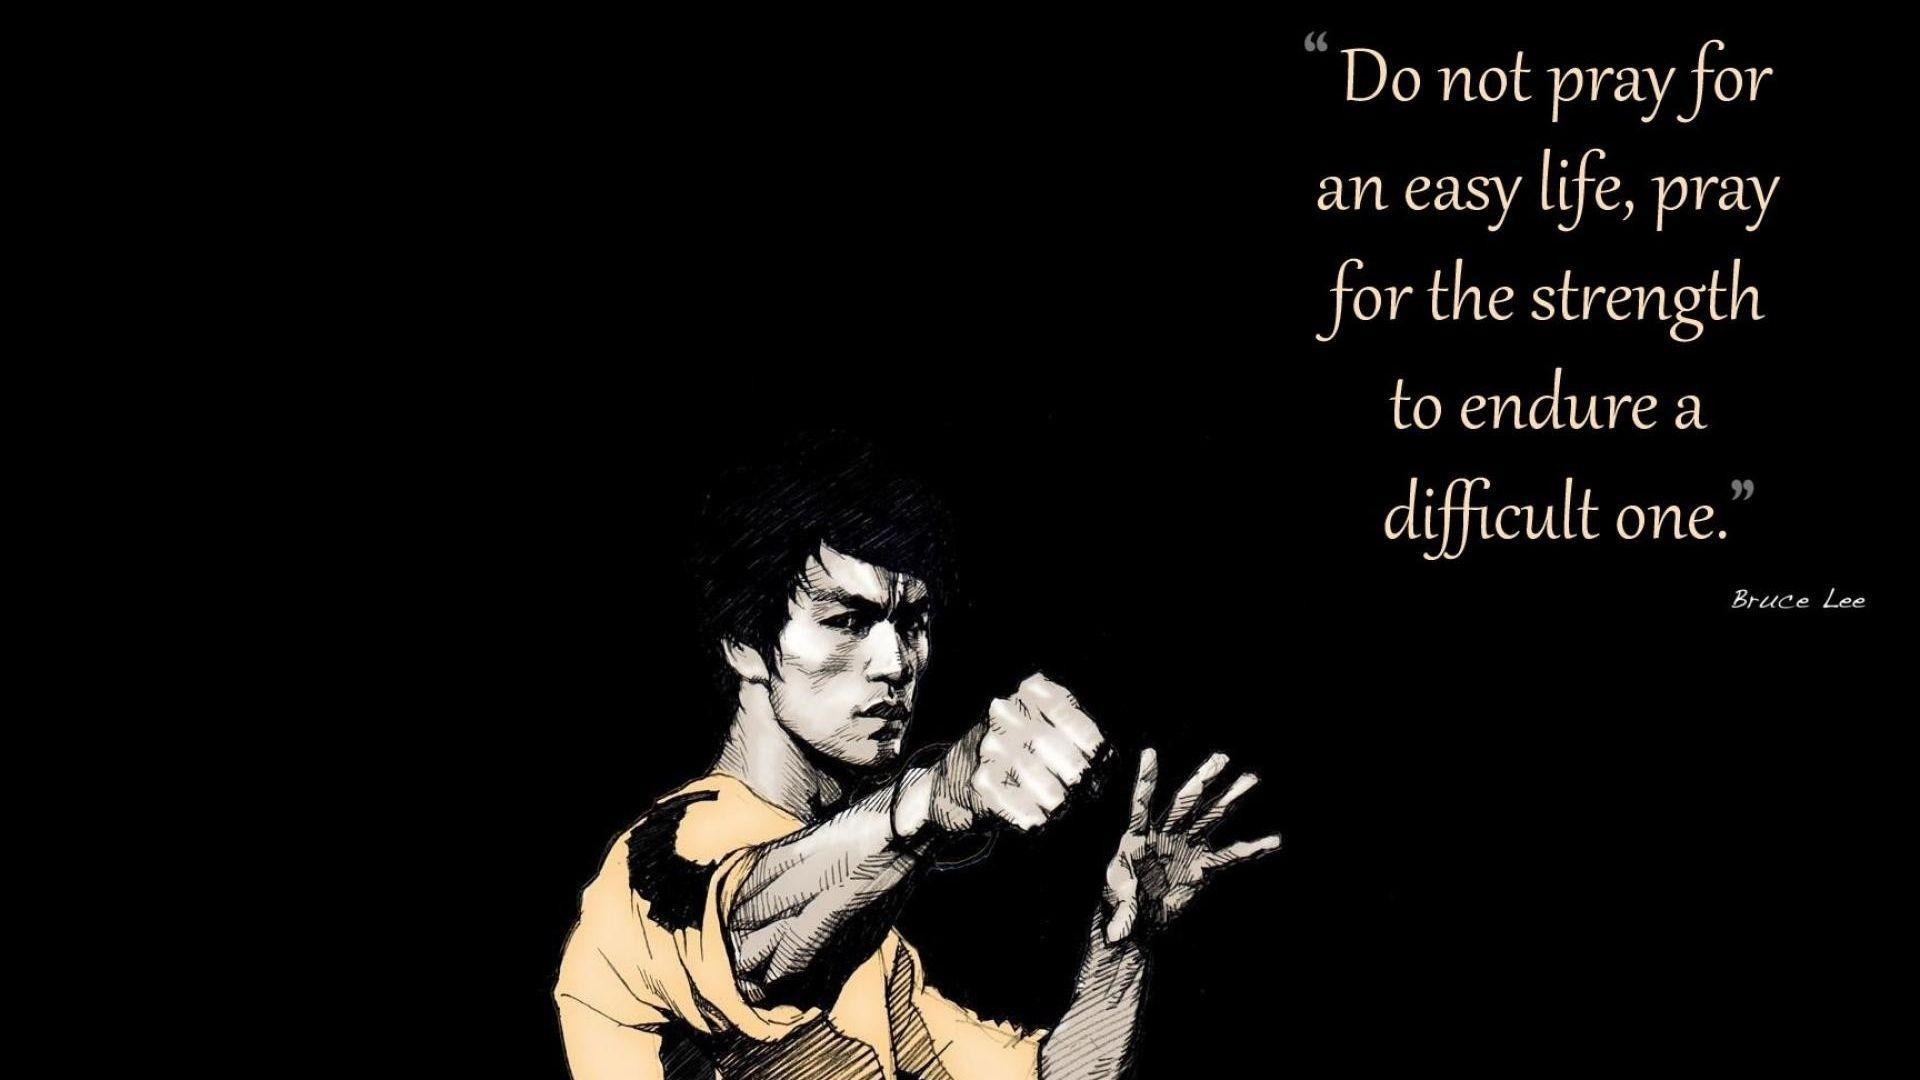 encouraging quotes for men